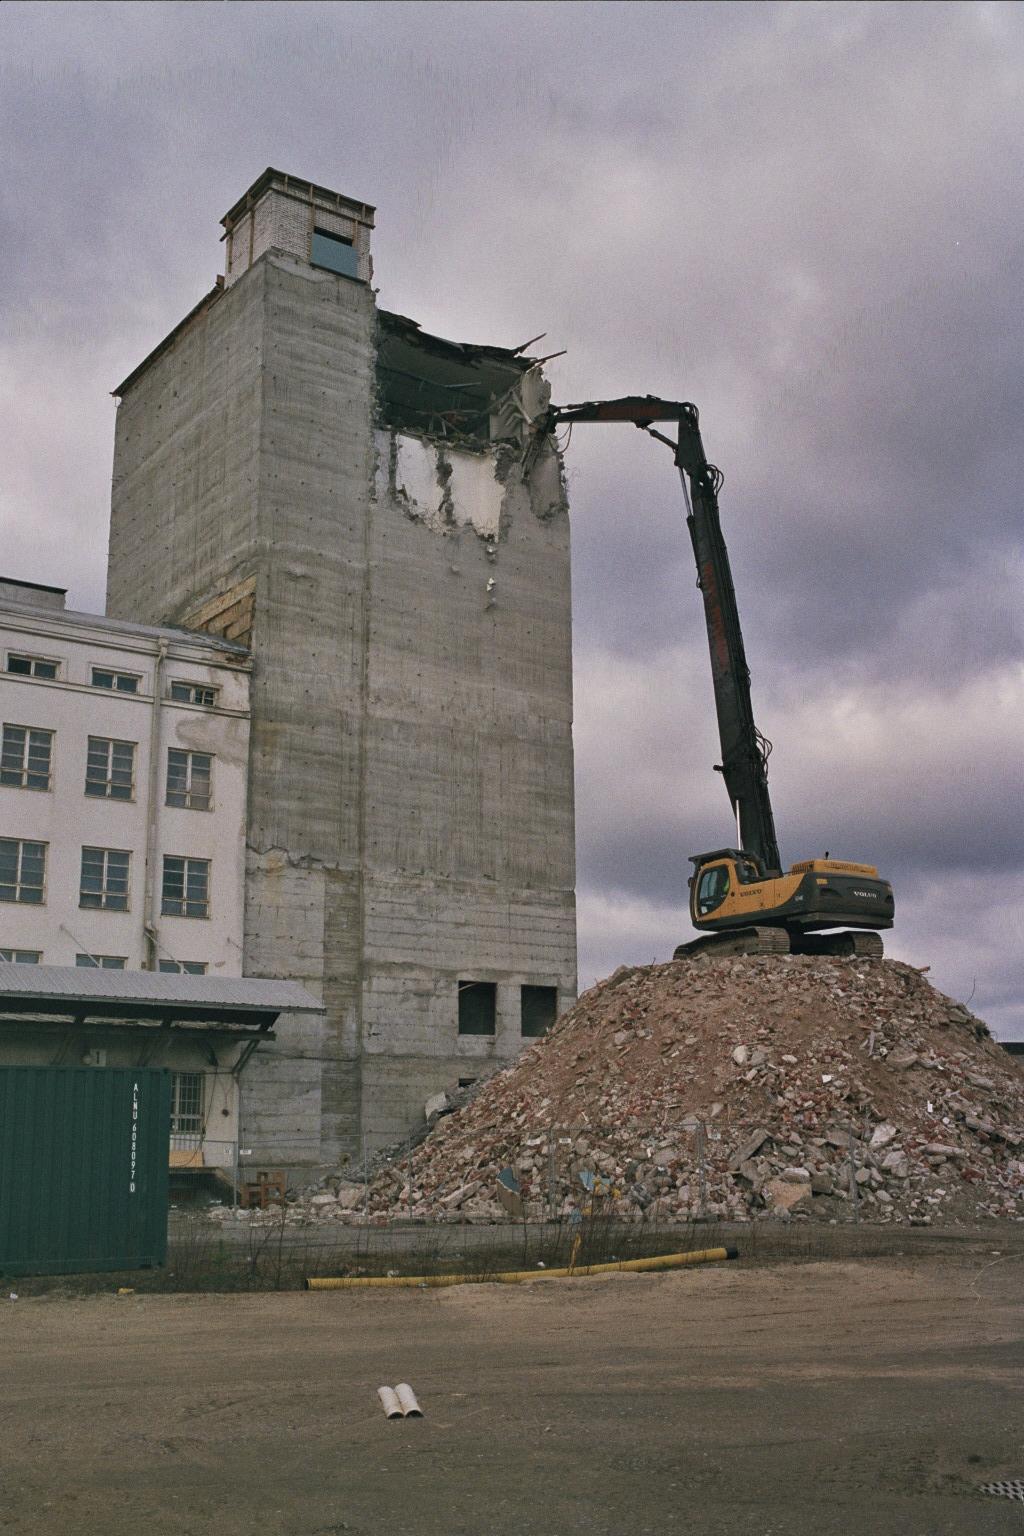 3 Silo Demolition : File silo demolition at sok mill in toppila may